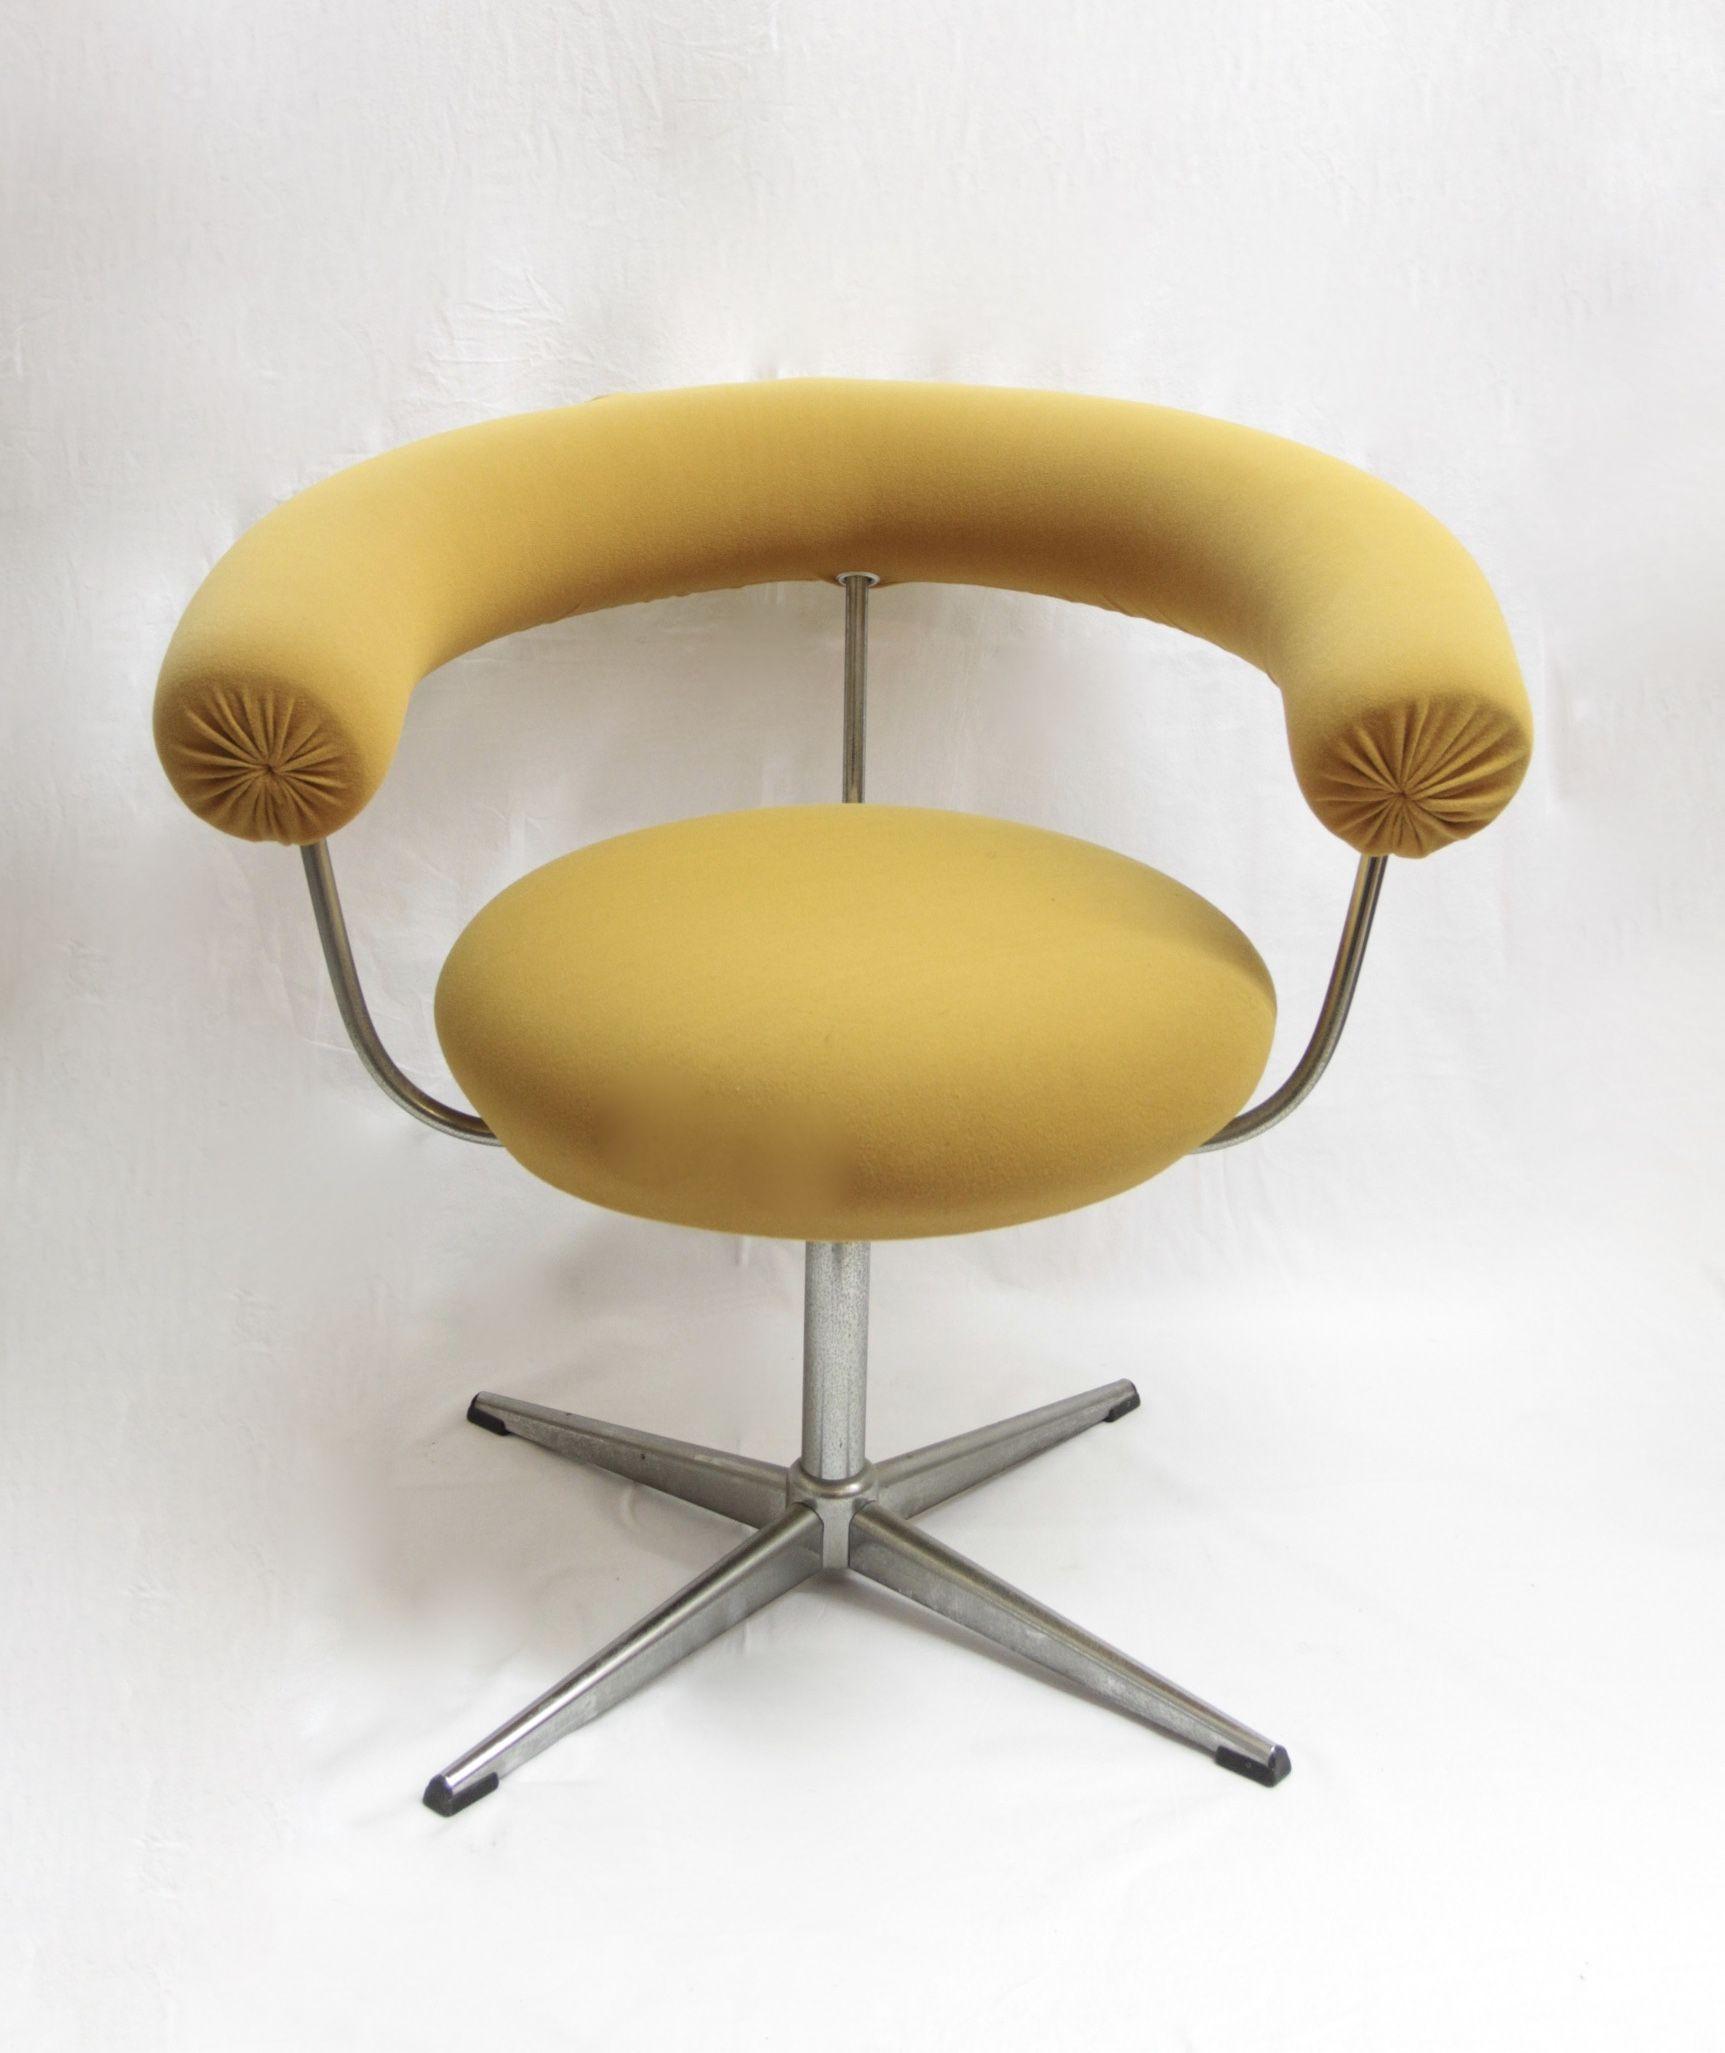 Sessel 70er Jahre Gelb Gelb Retro Design Painted Furniture Und